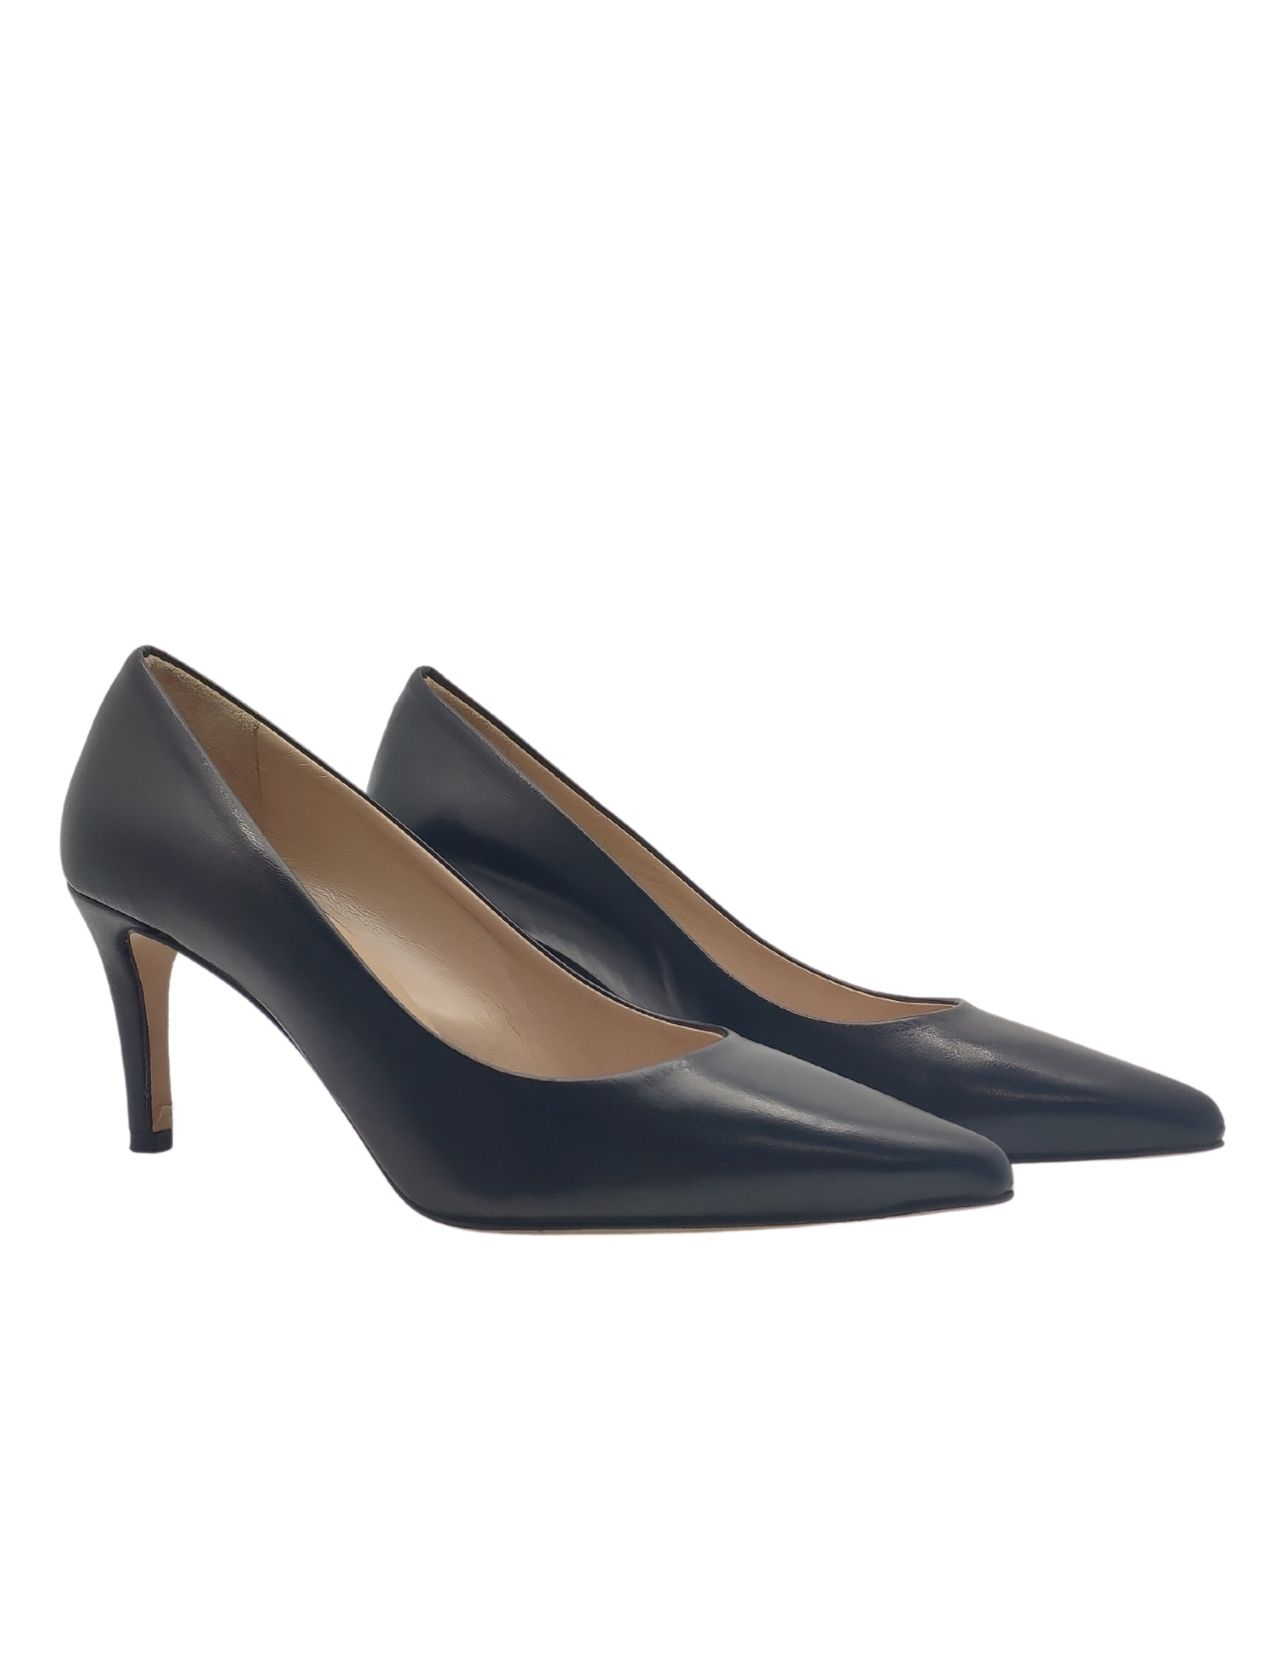 Women's High Heel Décolleté Spatarella | Pumps | GP70NERO